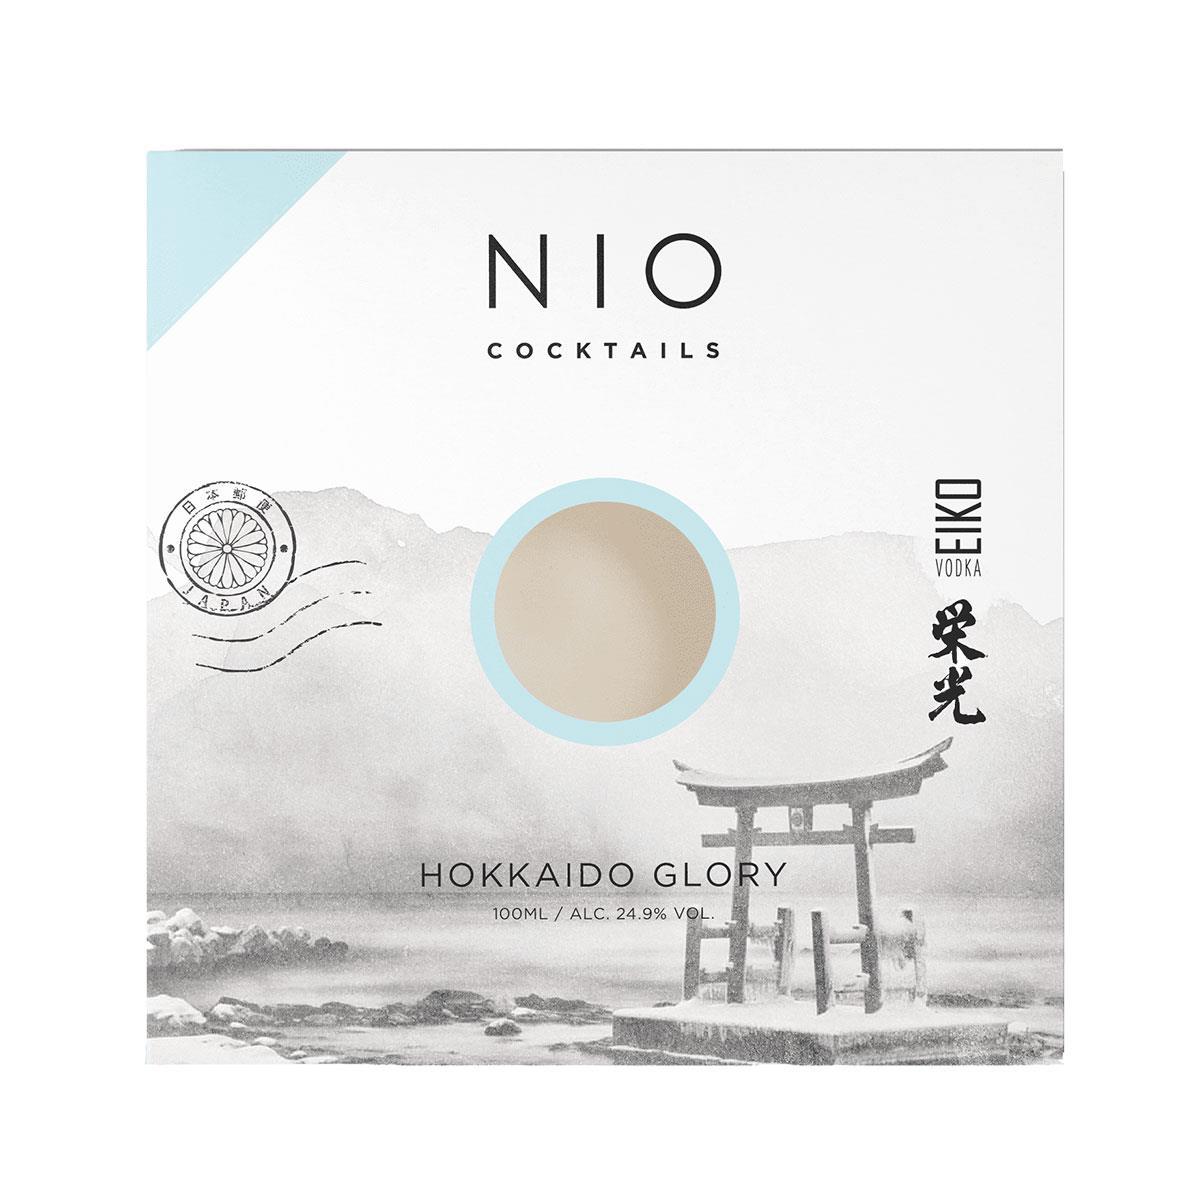 Nio coctails Hokkaido Glory 100ml